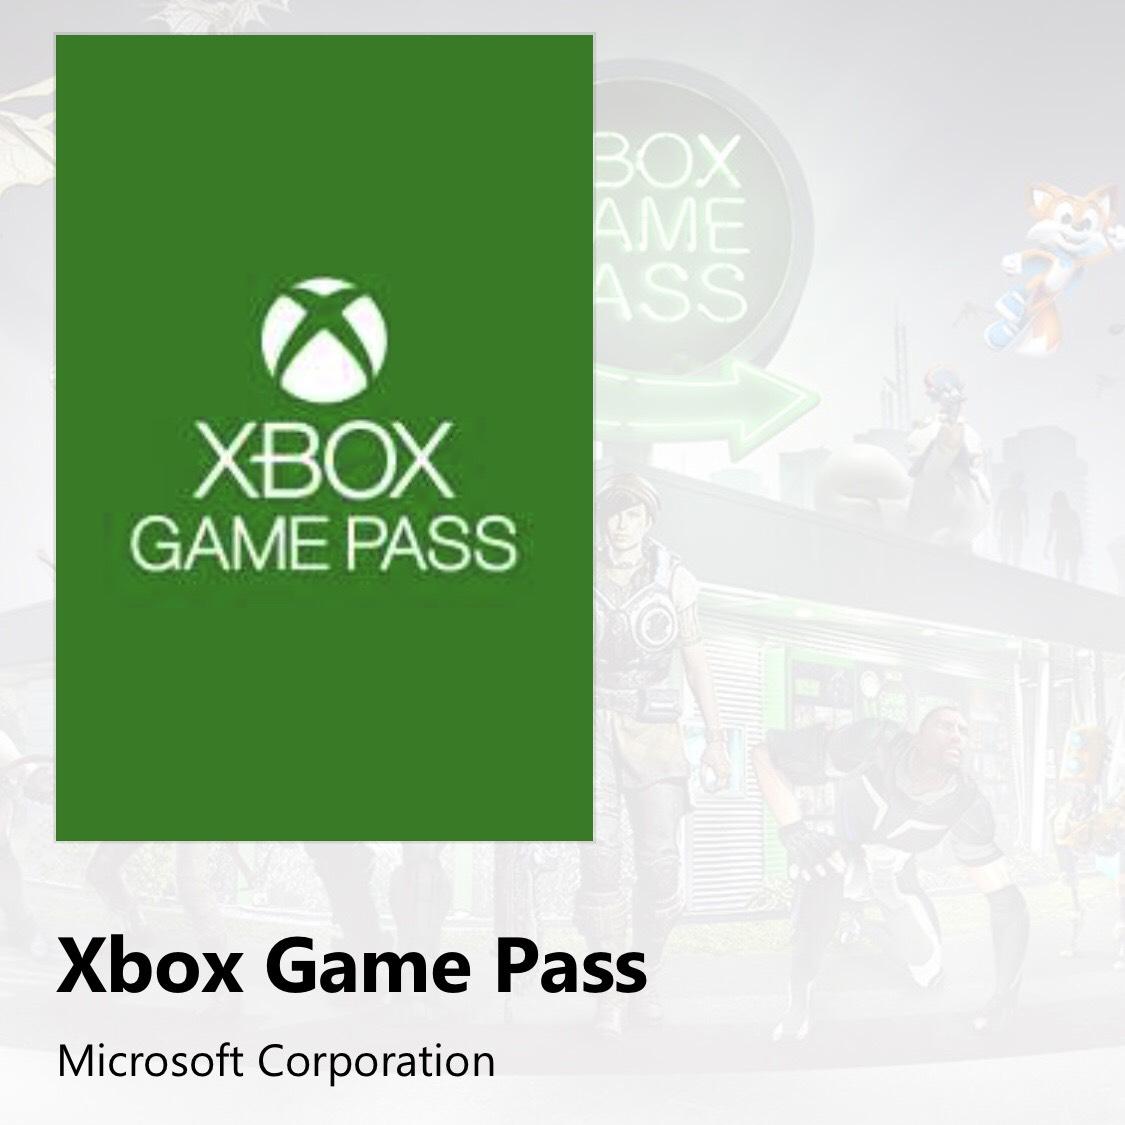 Xbox Game Pass Microsoft Corporation